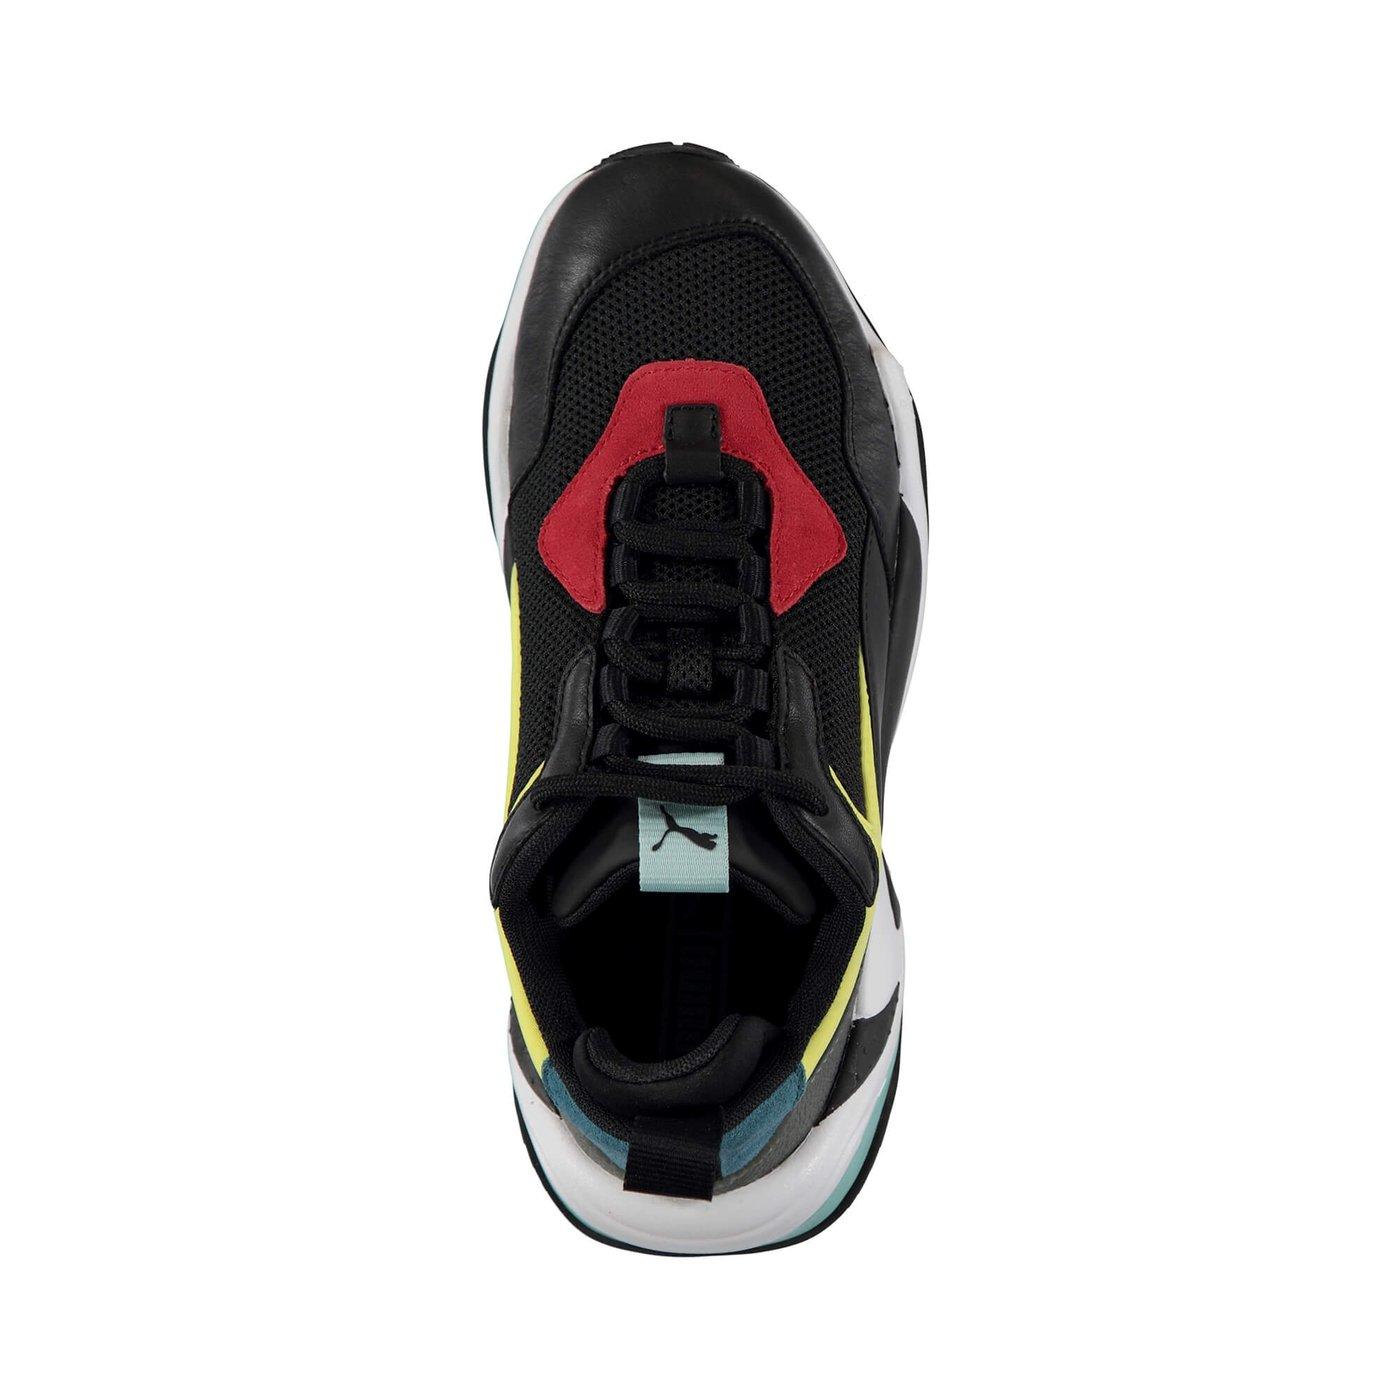 Puma Thunder Spectra Erkek Siyah Spor Ayakkabı